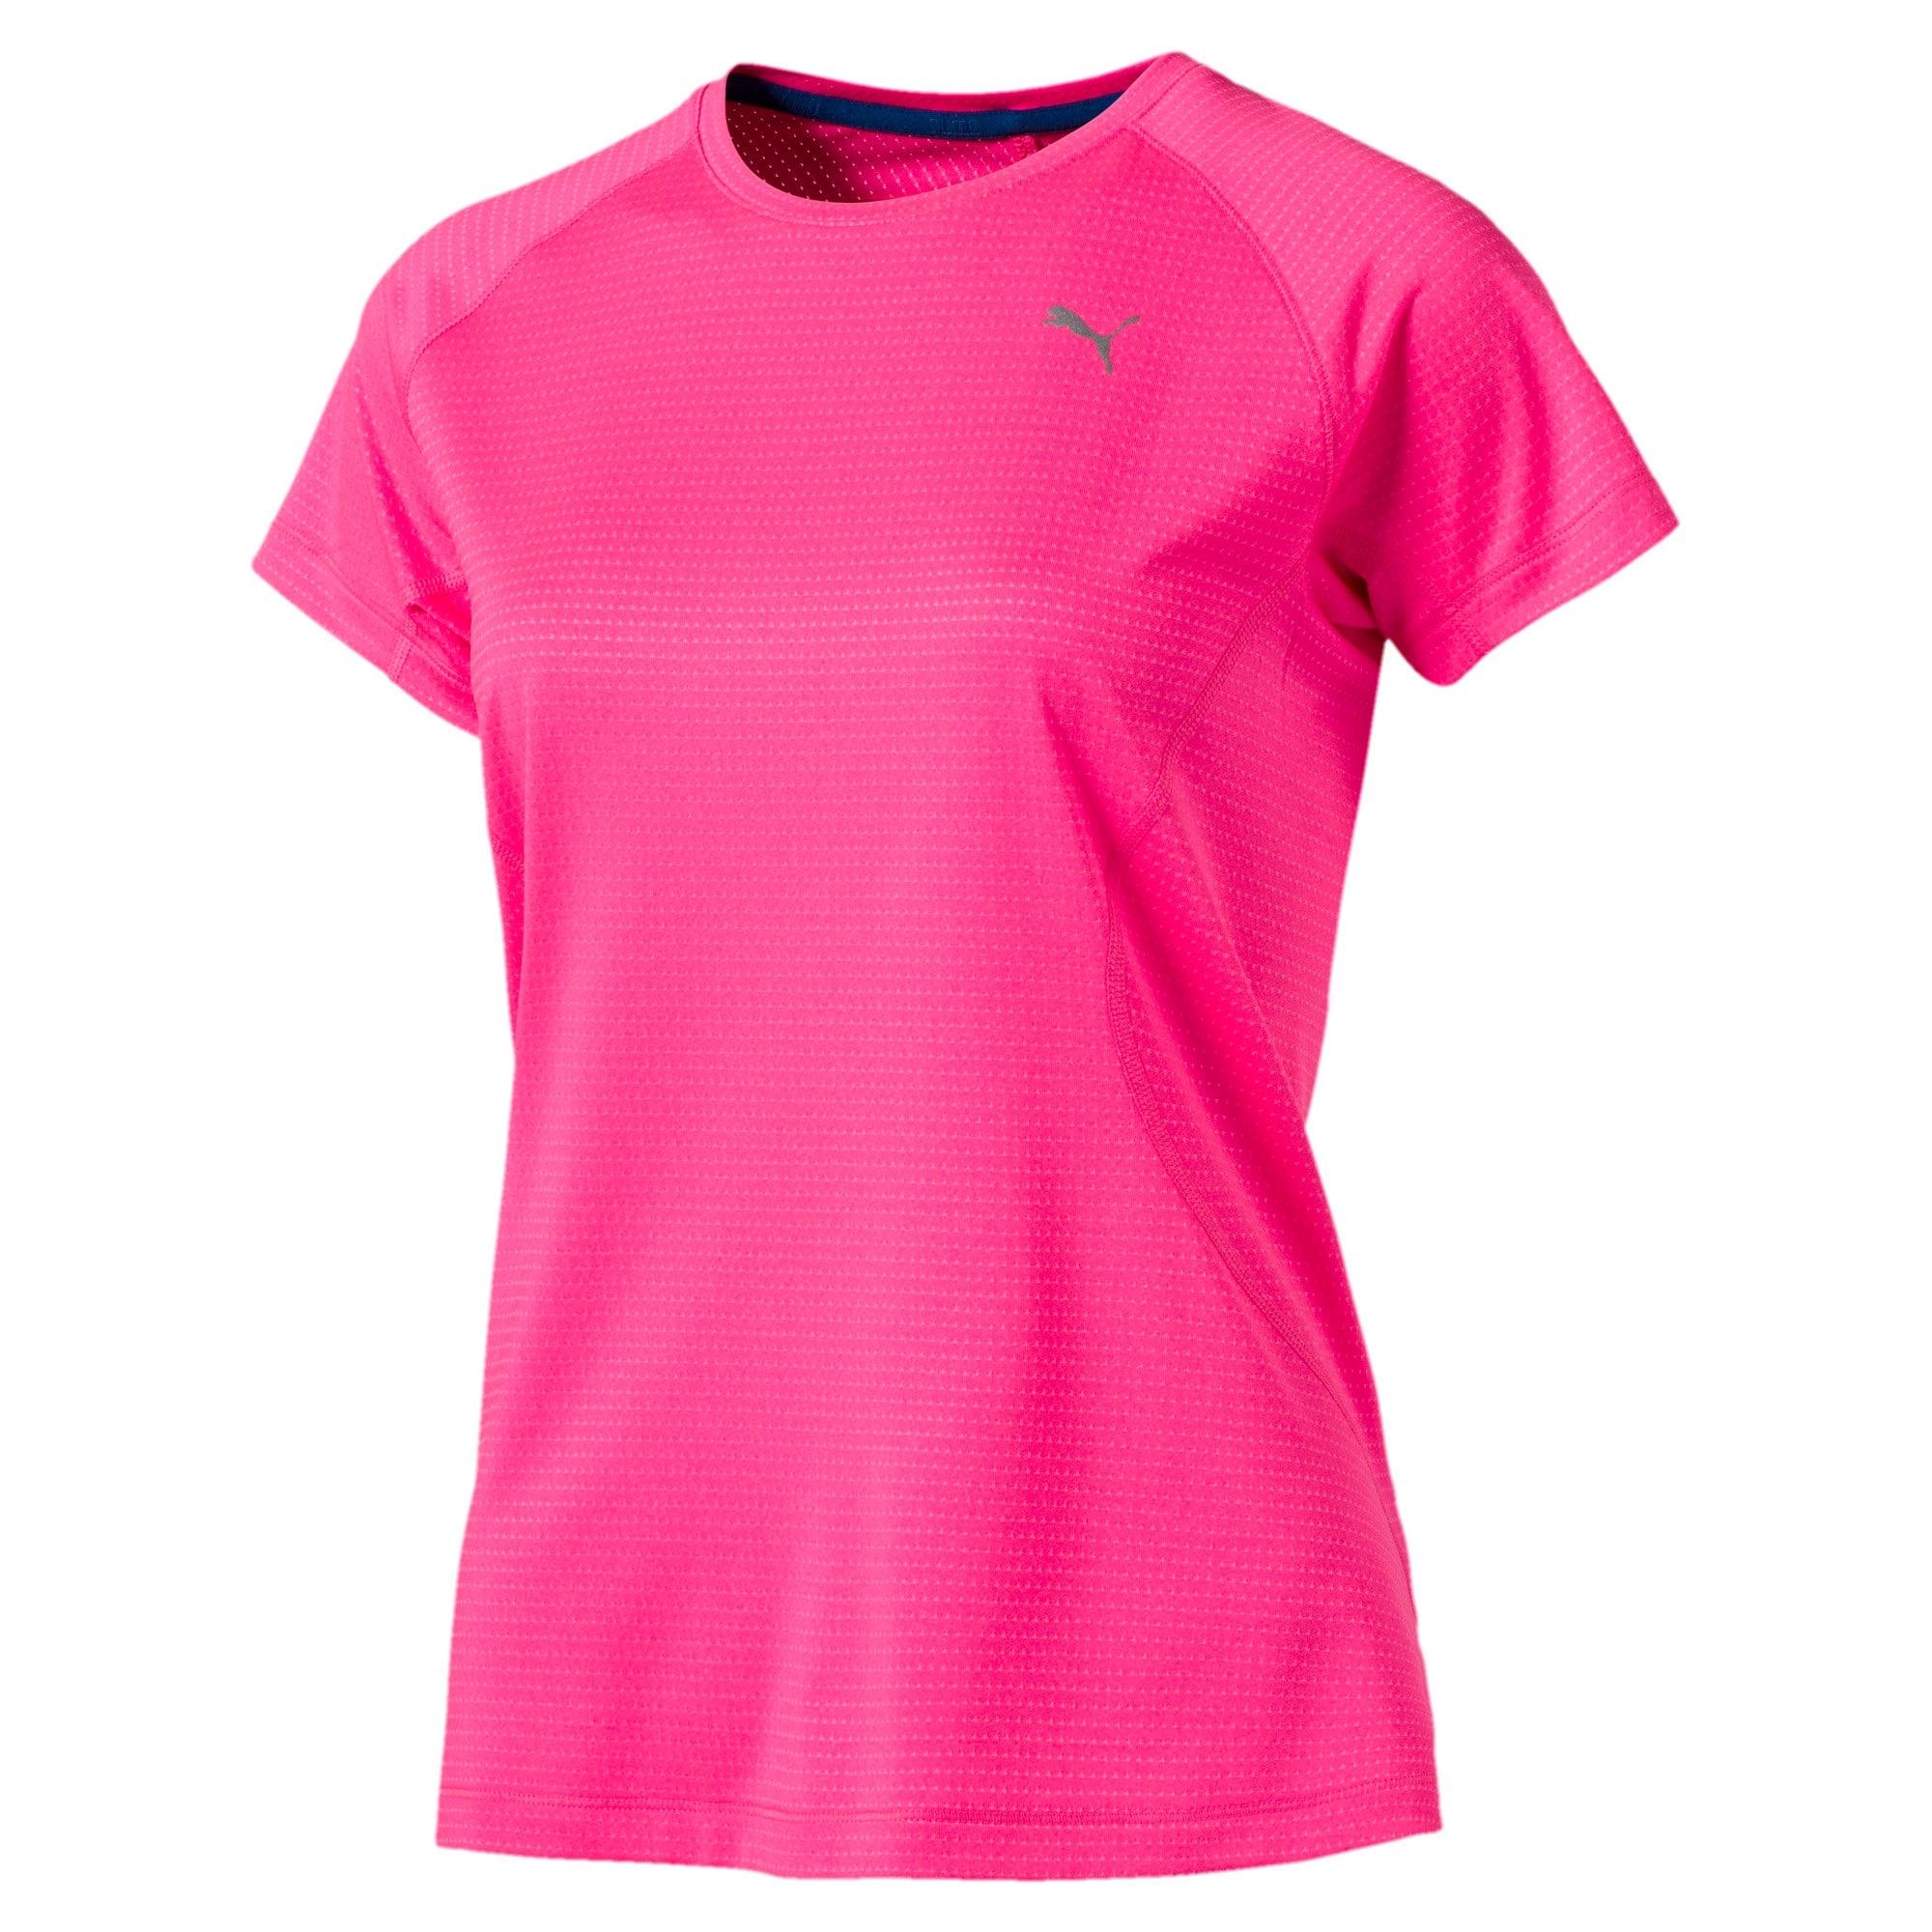 Thumbnail 3 of Women's Running Speed Short Sleeves Tee, KNOCKOUT PINK Heather, medium-IND